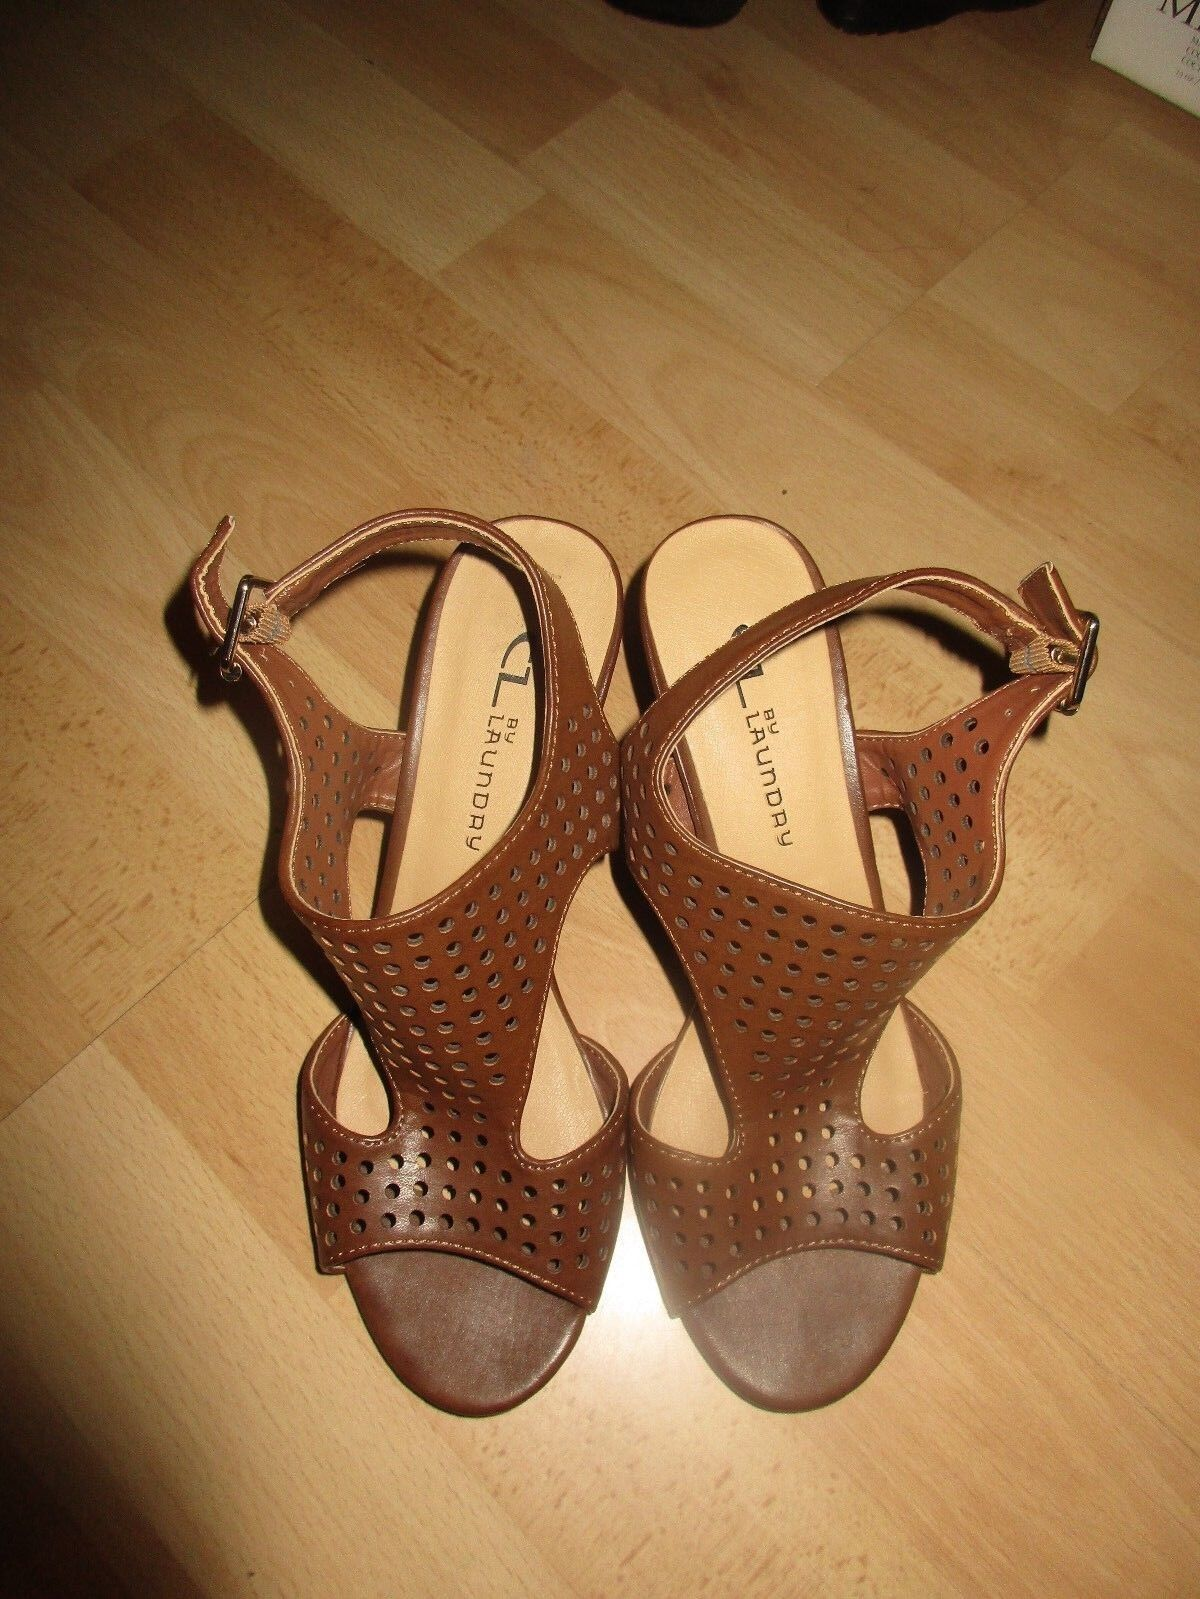 Women's CL Laundry Brown 6 sandals size 6 Brown M* 9b73e0